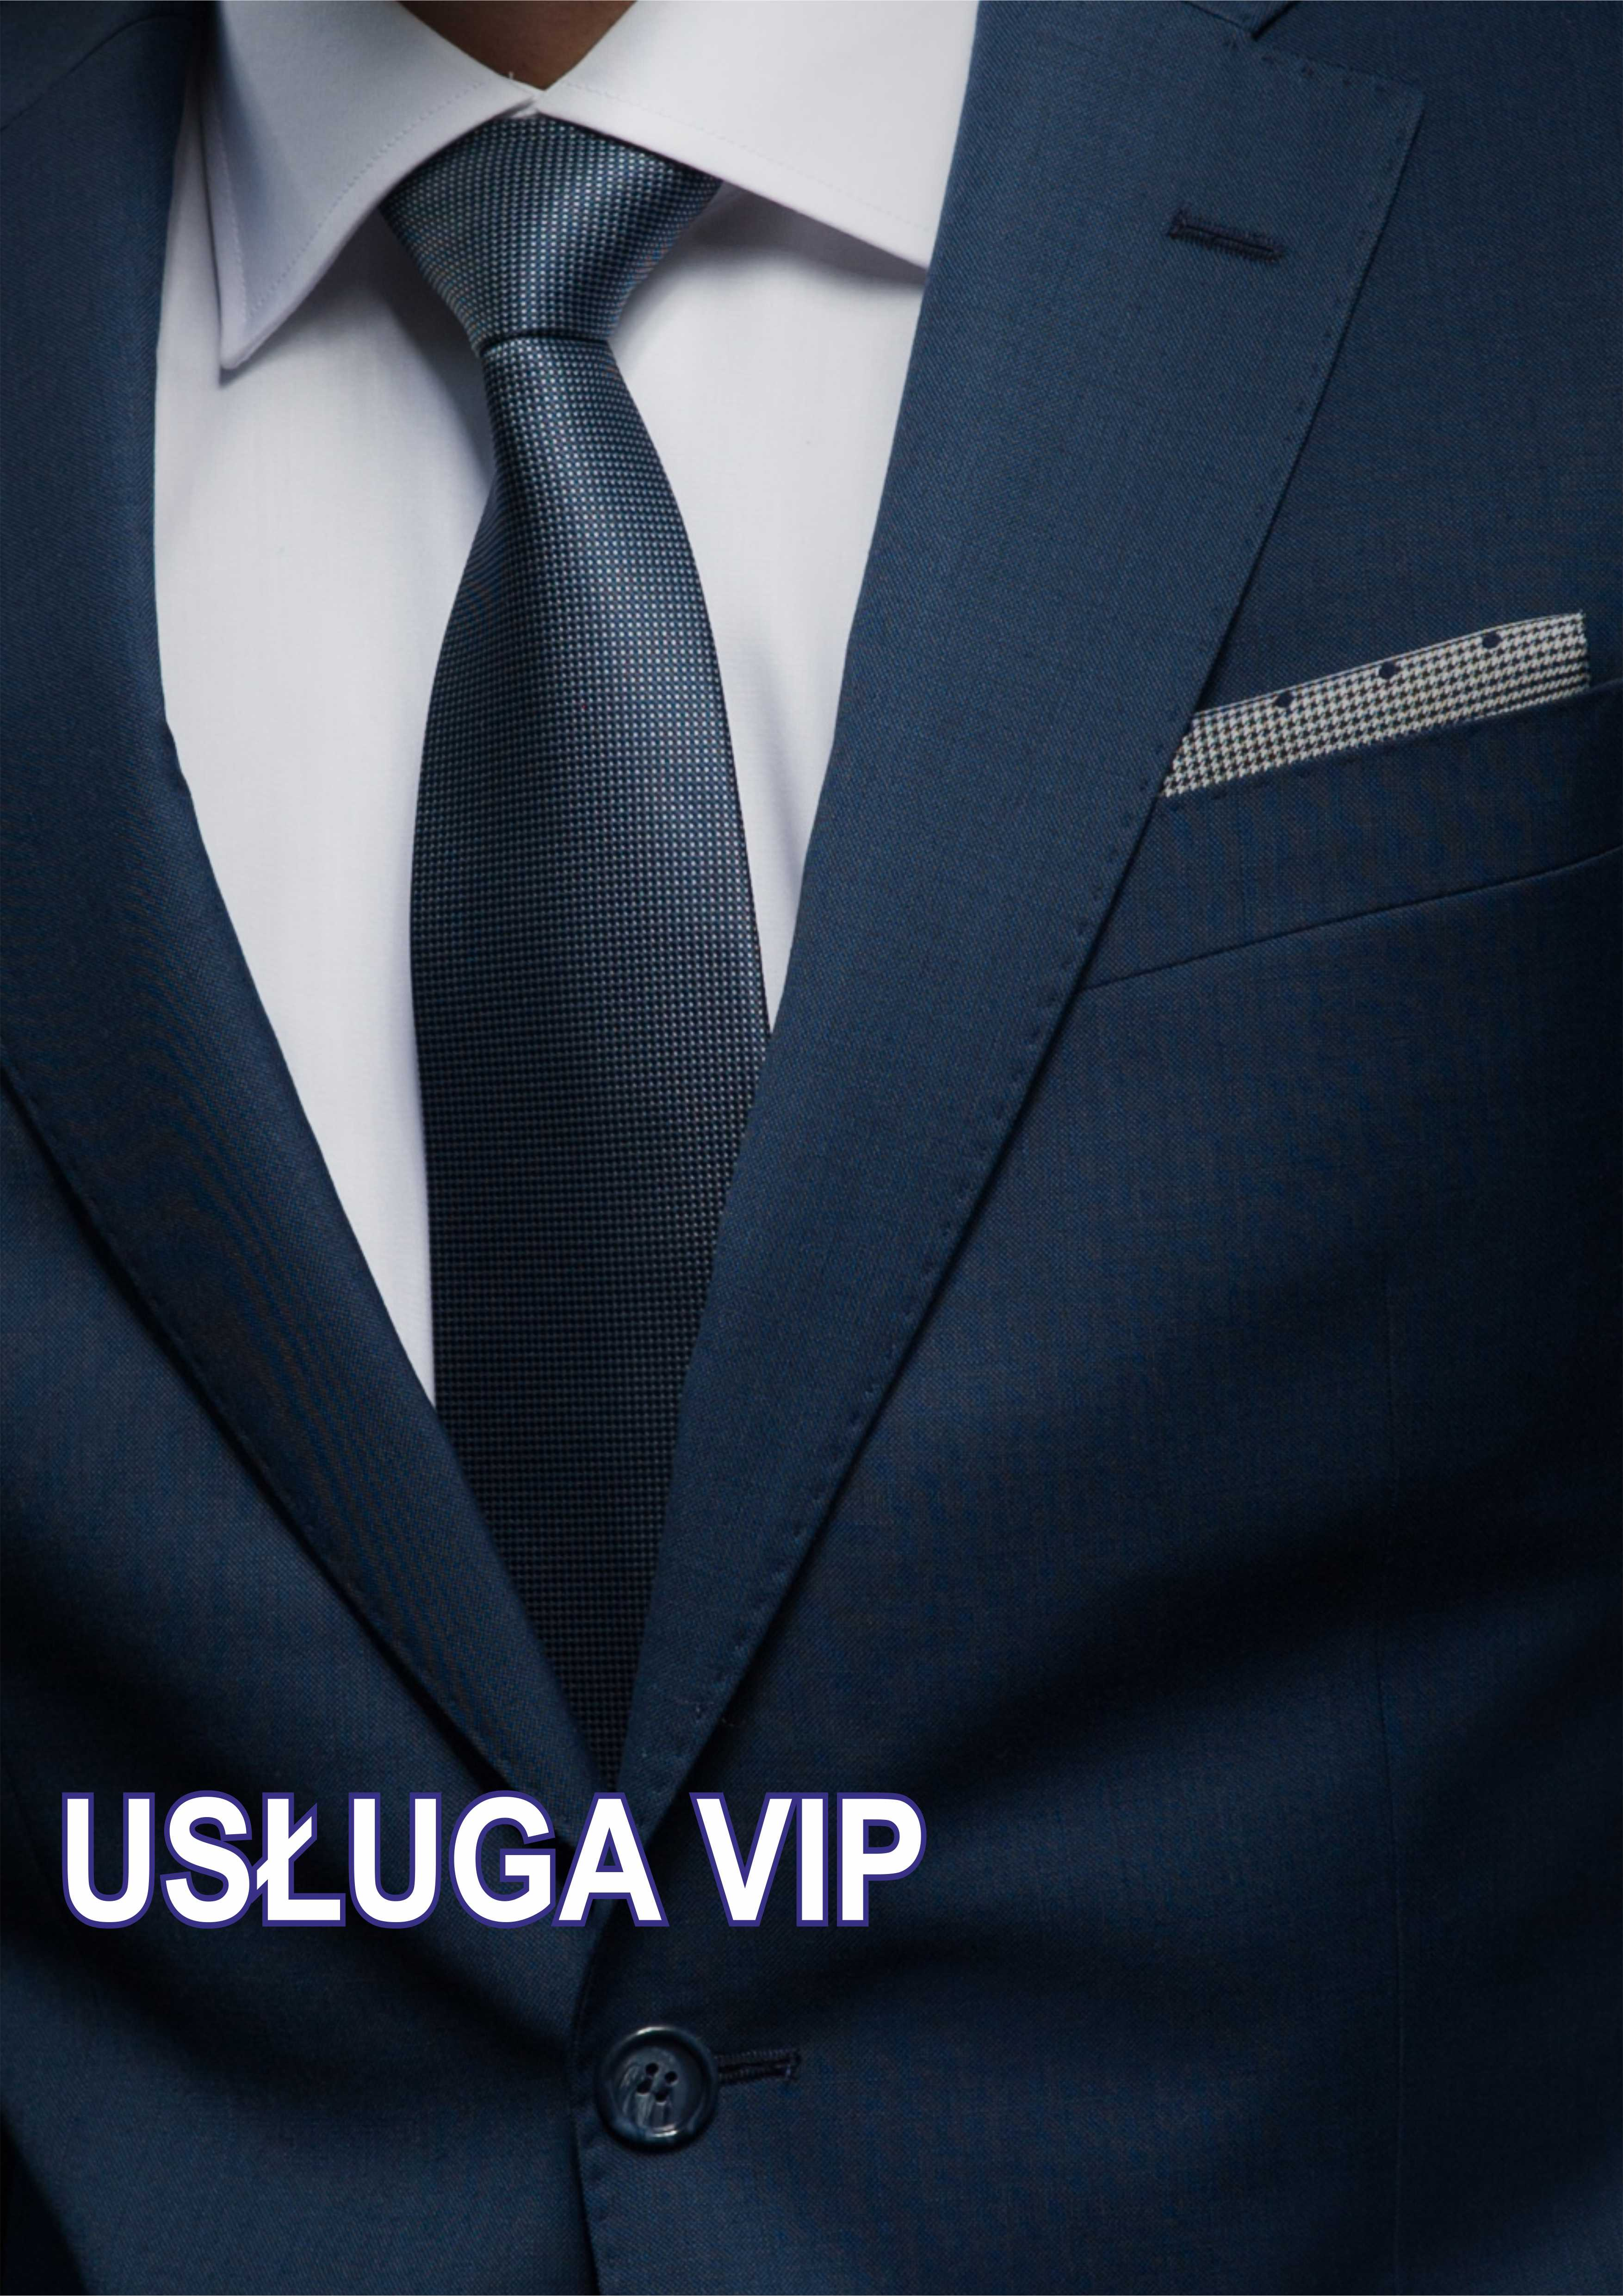 Usługa VIP